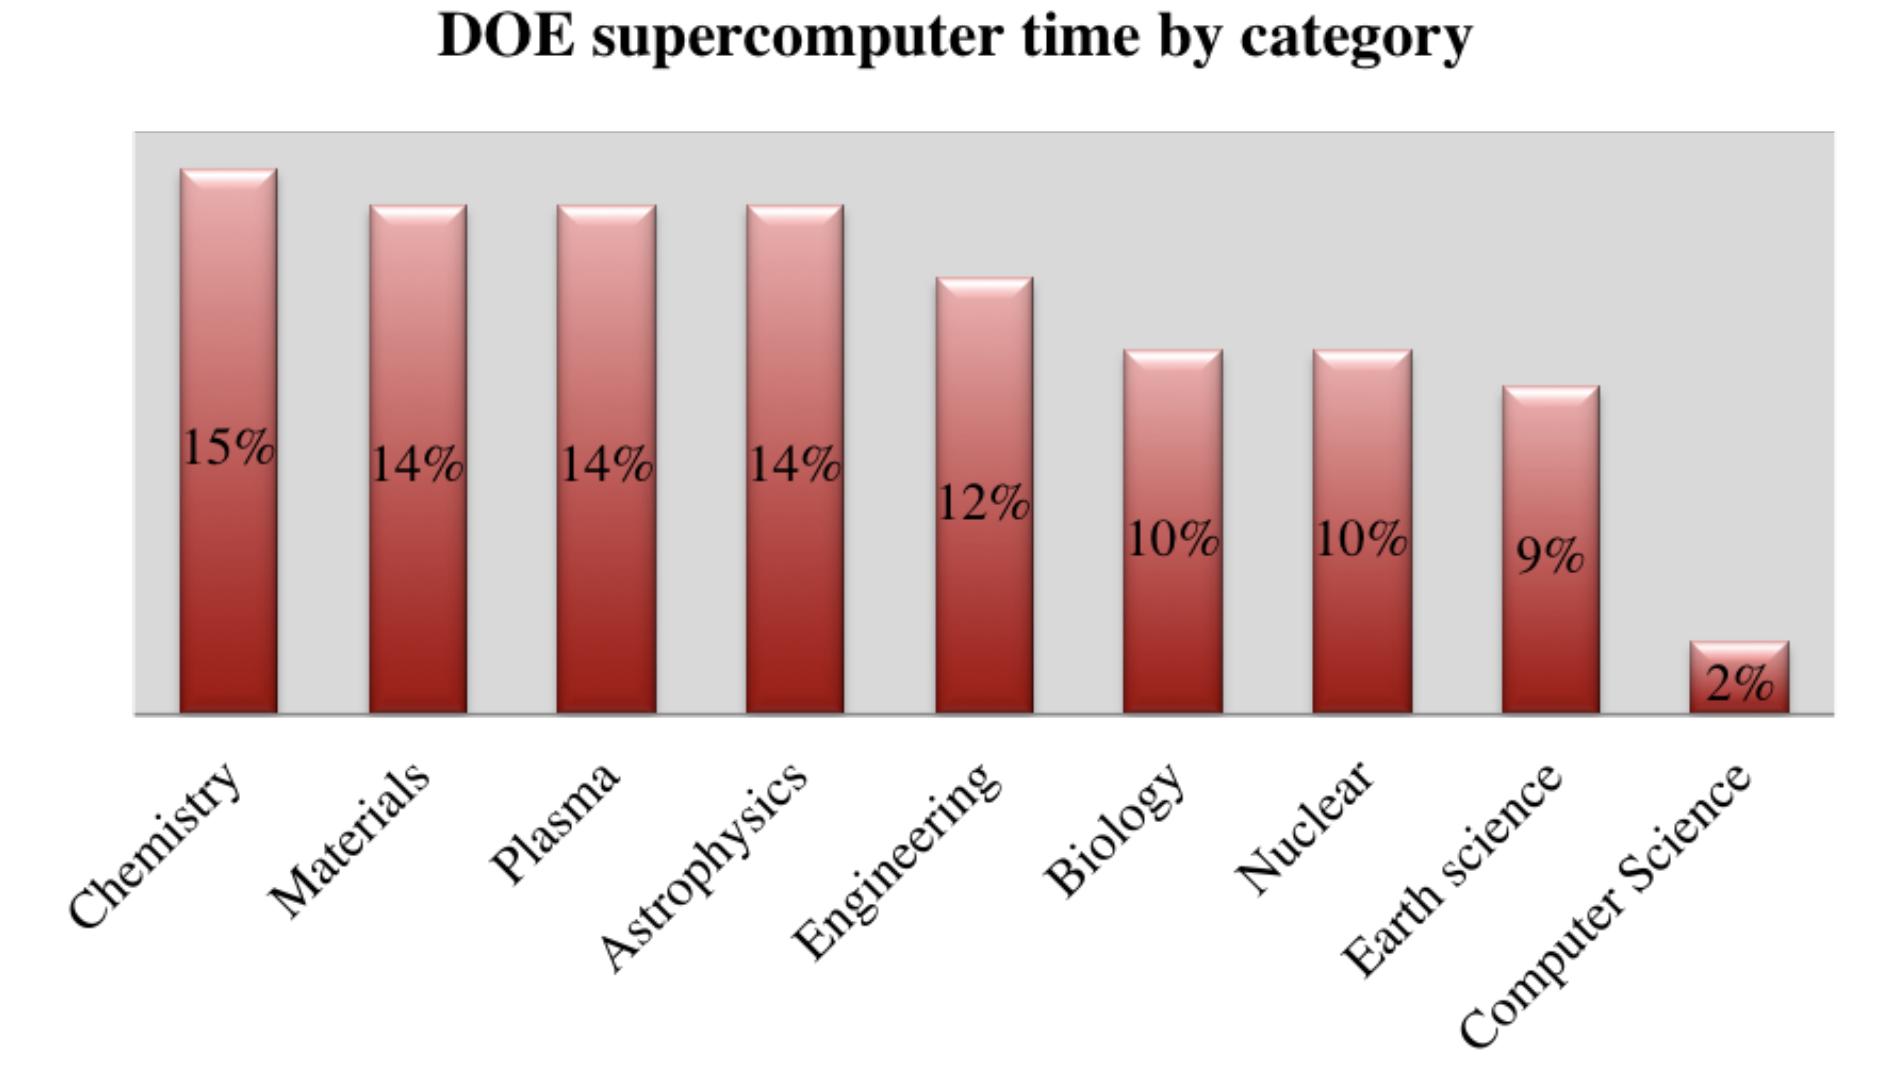 Data source:  http://www.doeleadershipcomputing.org/